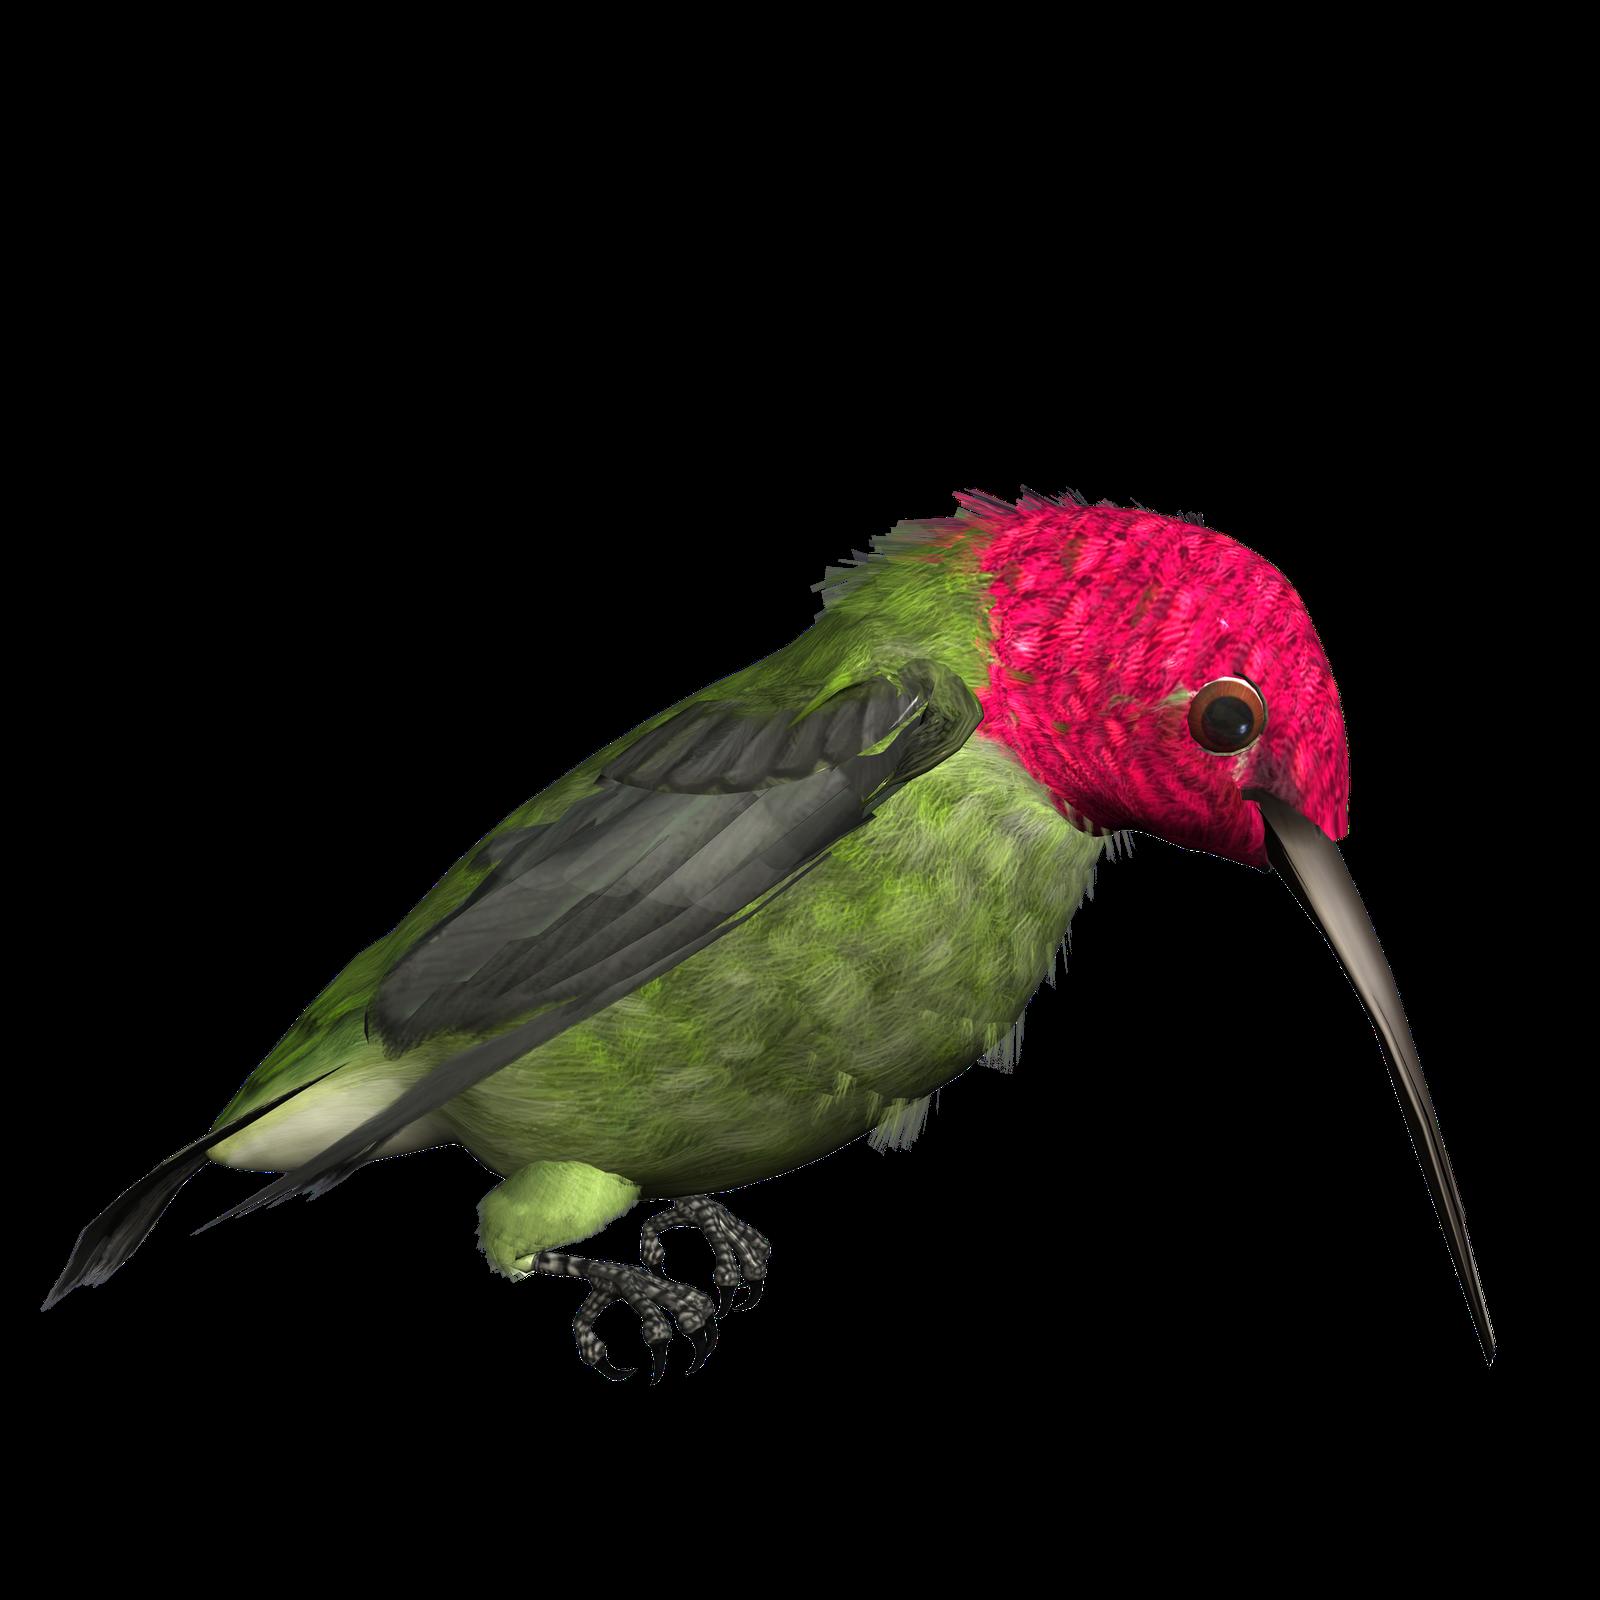 Panda free images hummingbirdclipart. Hummingbird clipart anna's hummingbird